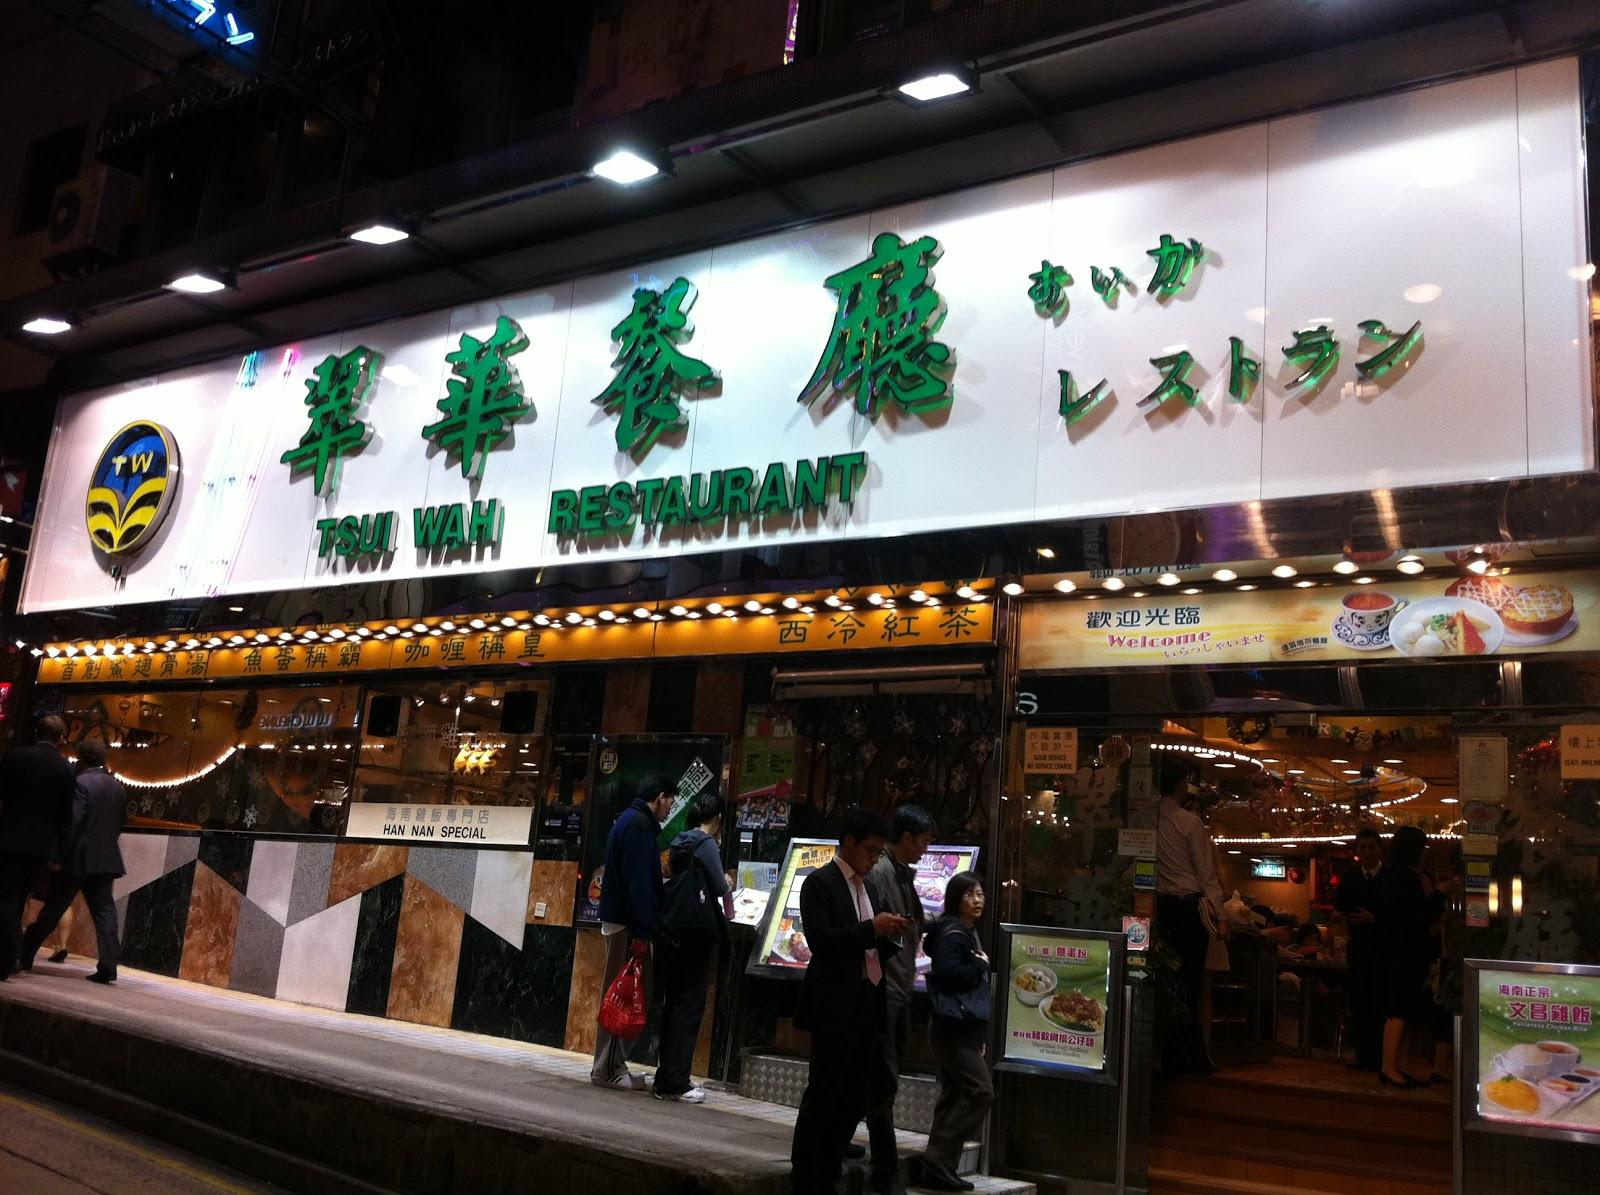 foodiefc tsui wah restaurant hong kong. Black Bedroom Furniture Sets. Home Design Ideas